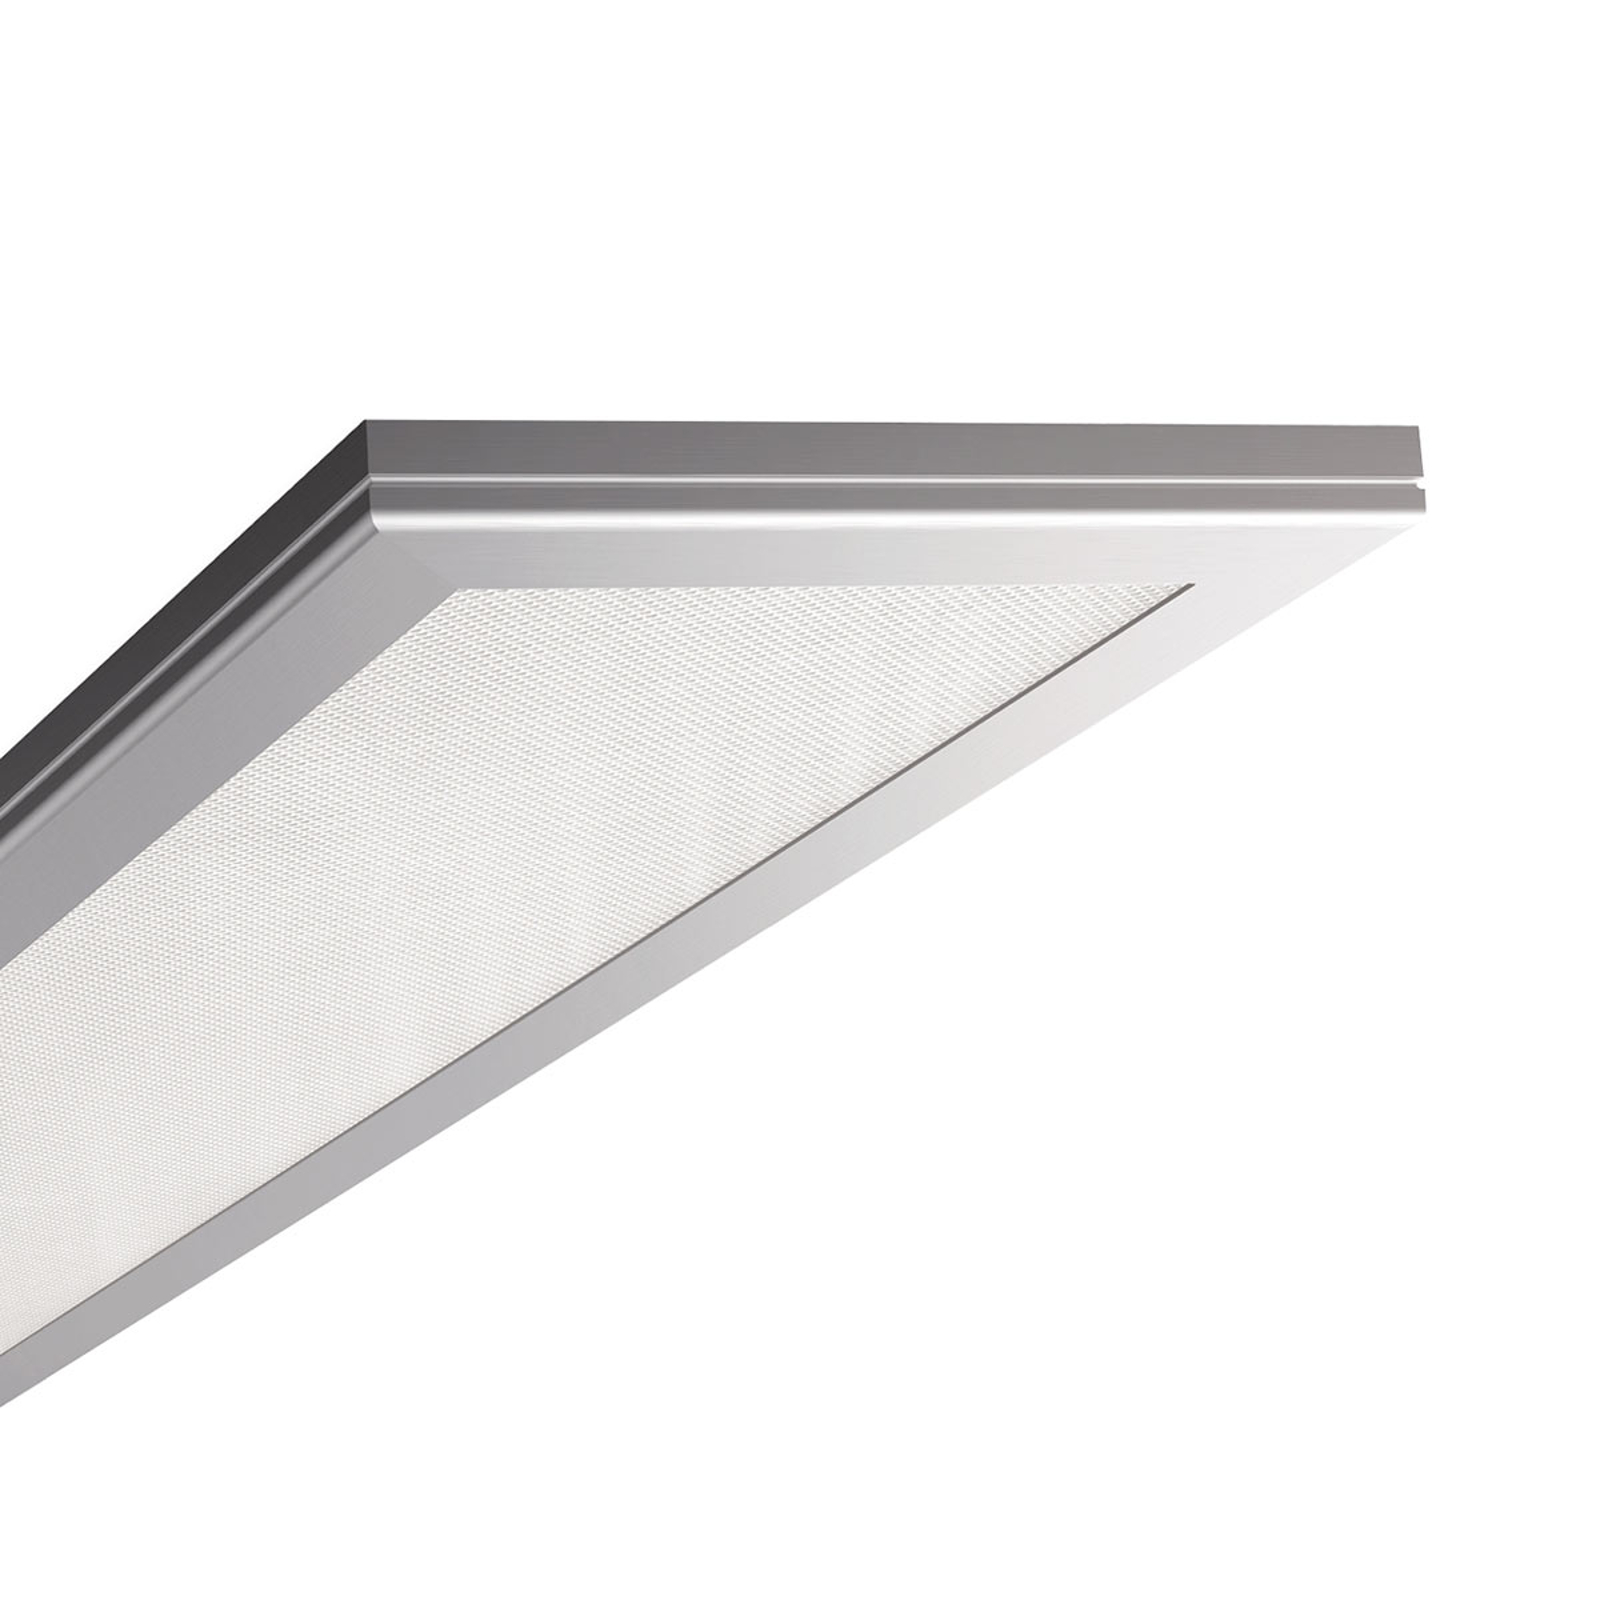 Plafoniera LED microprismi Visula BAP 150